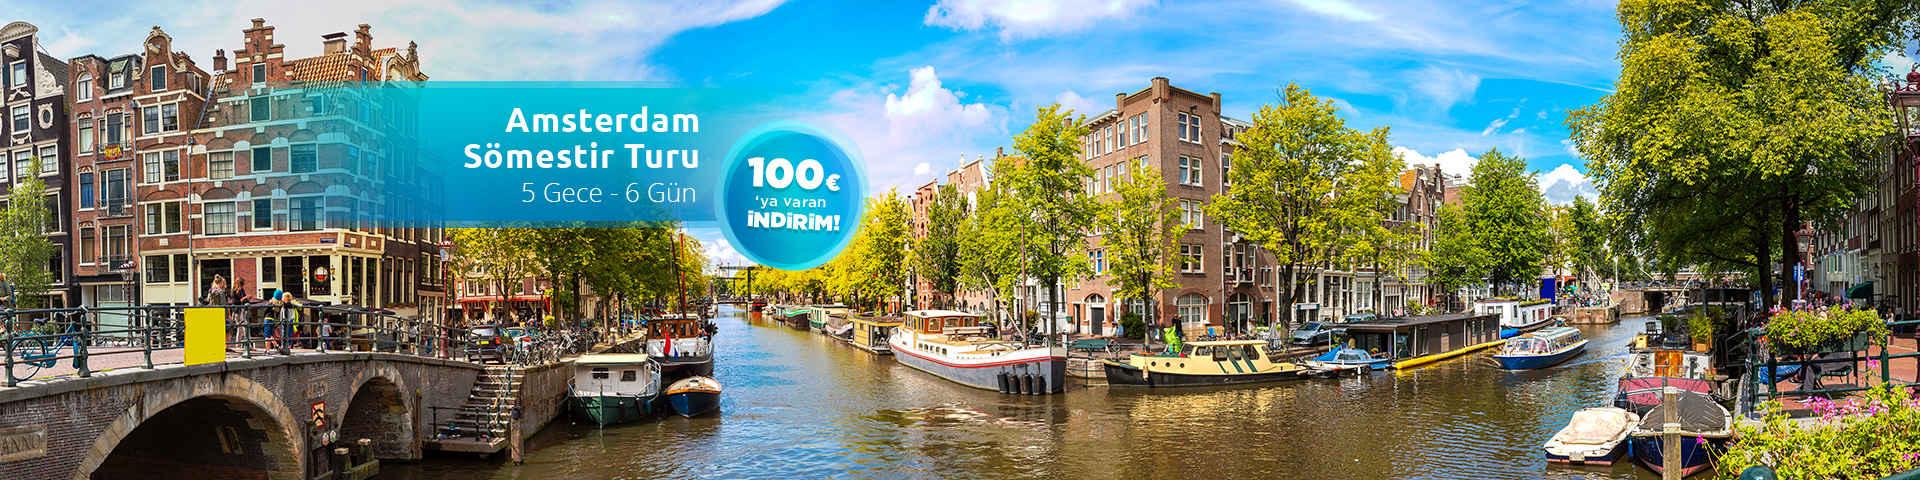 Amsterdam Sömestir Turu